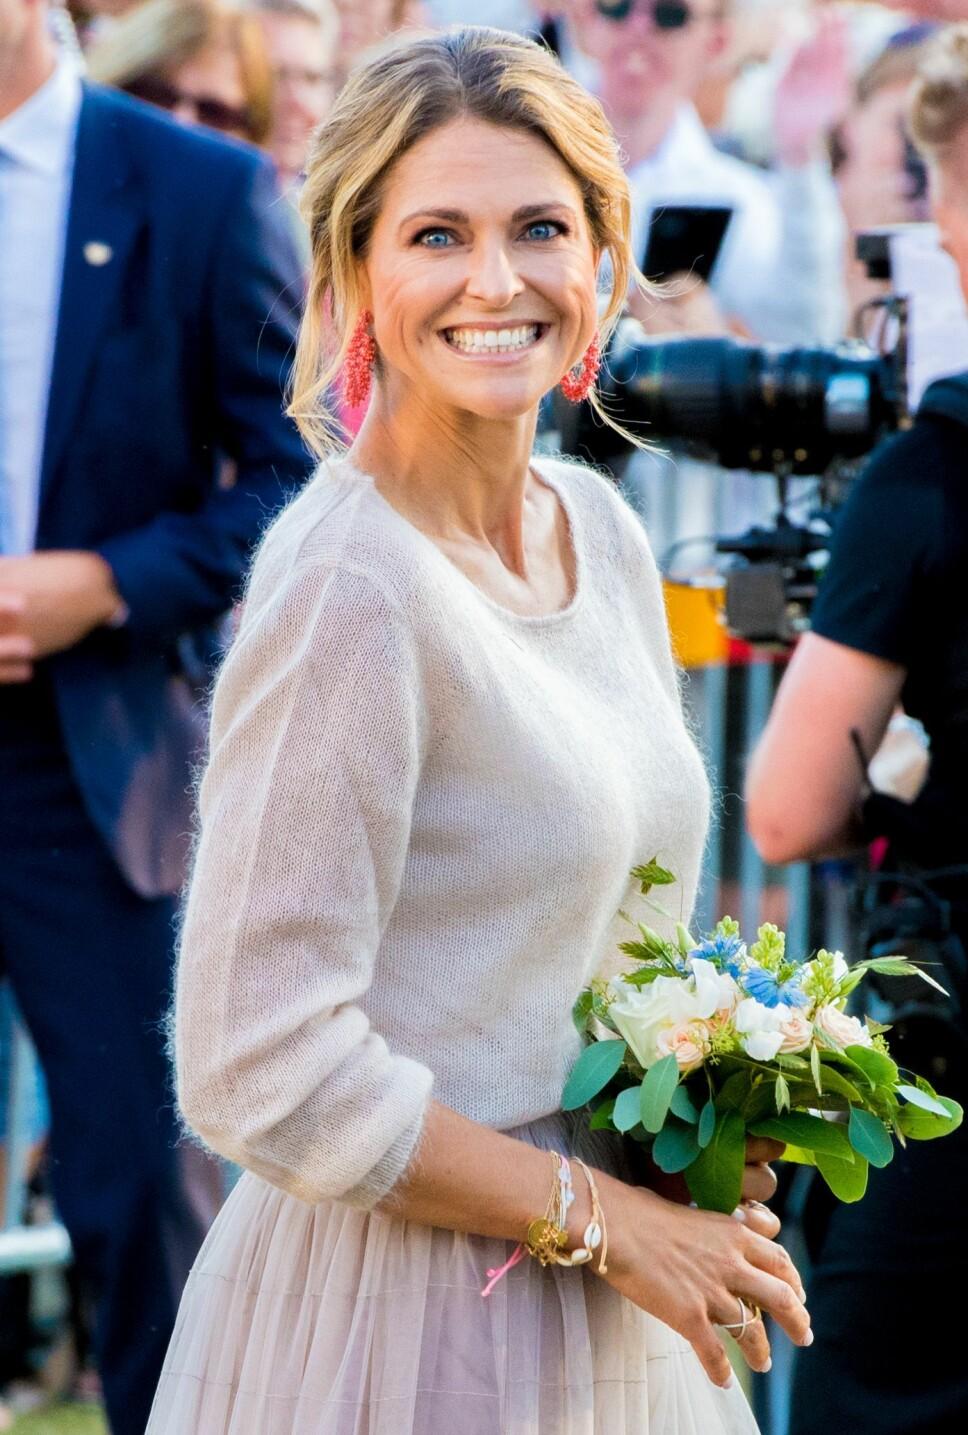 KORTVARIG LYKKE: Prinsesse Madeleine strålte da hun kom hjem til Sverige i juni. Da ante hun lite om hva sommeren skulle bringe.